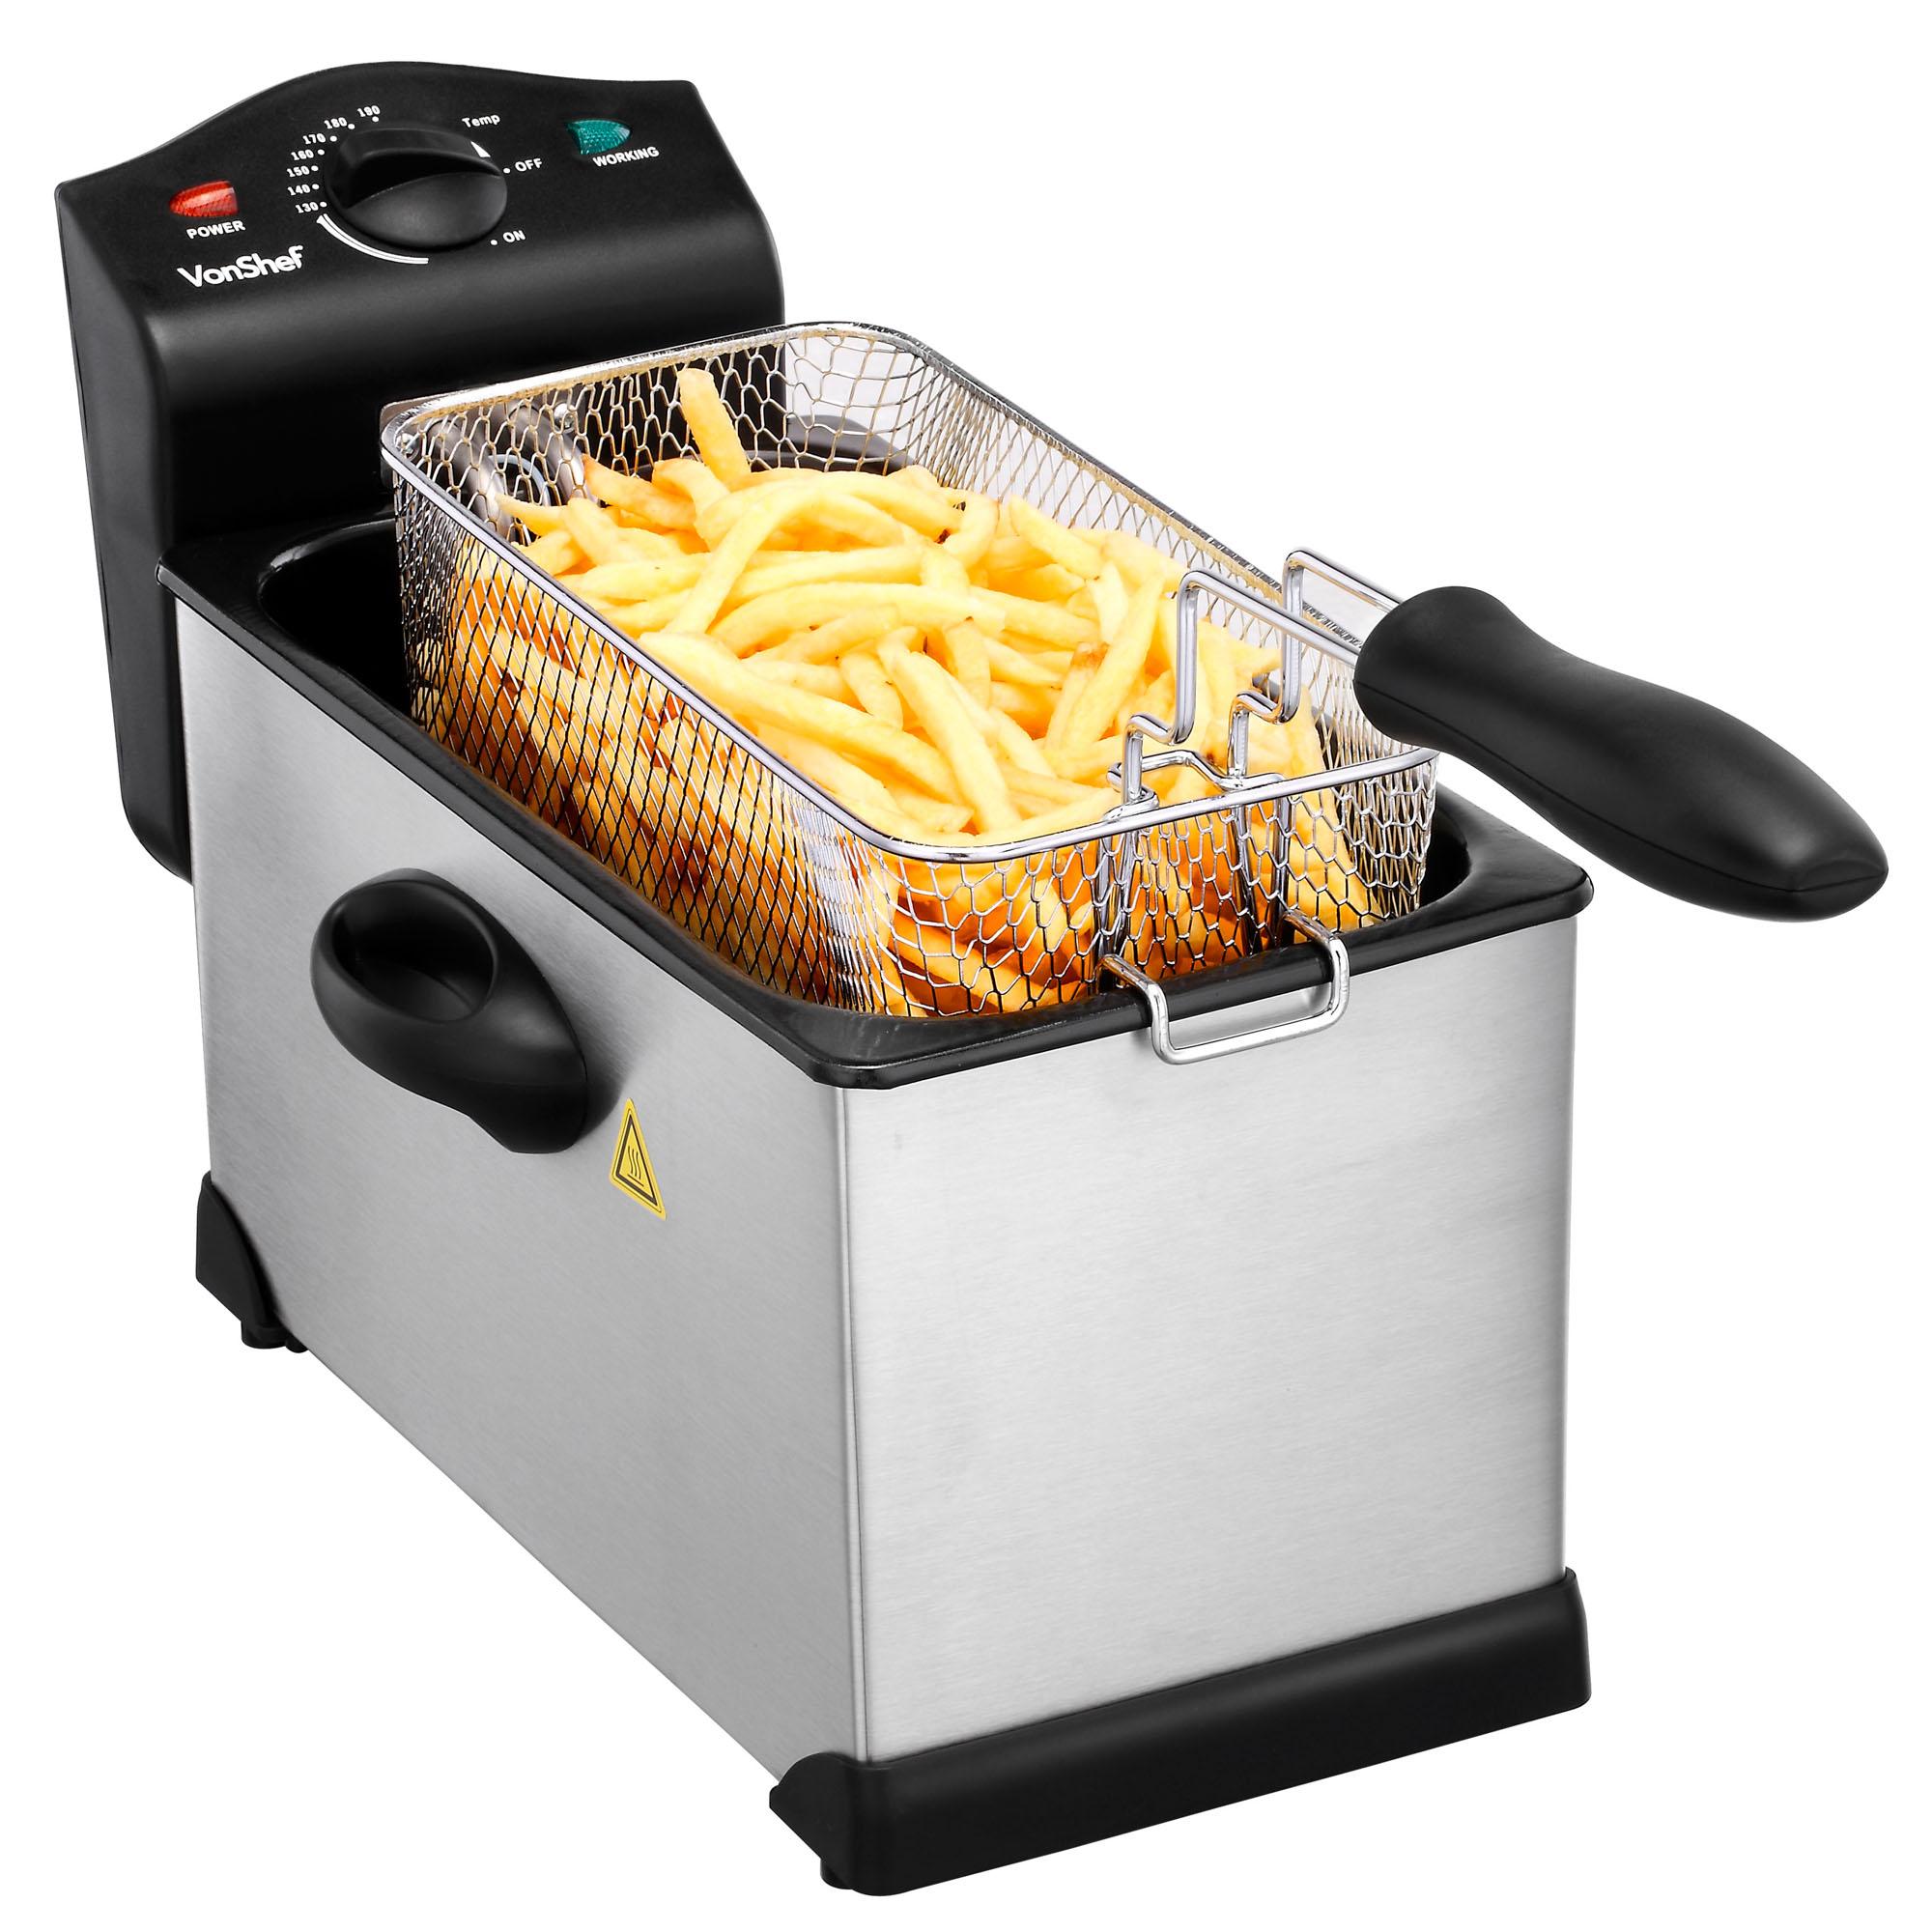 Vonshef Fat Fryer Deep 3 Litre Chip Pan Basket Fry